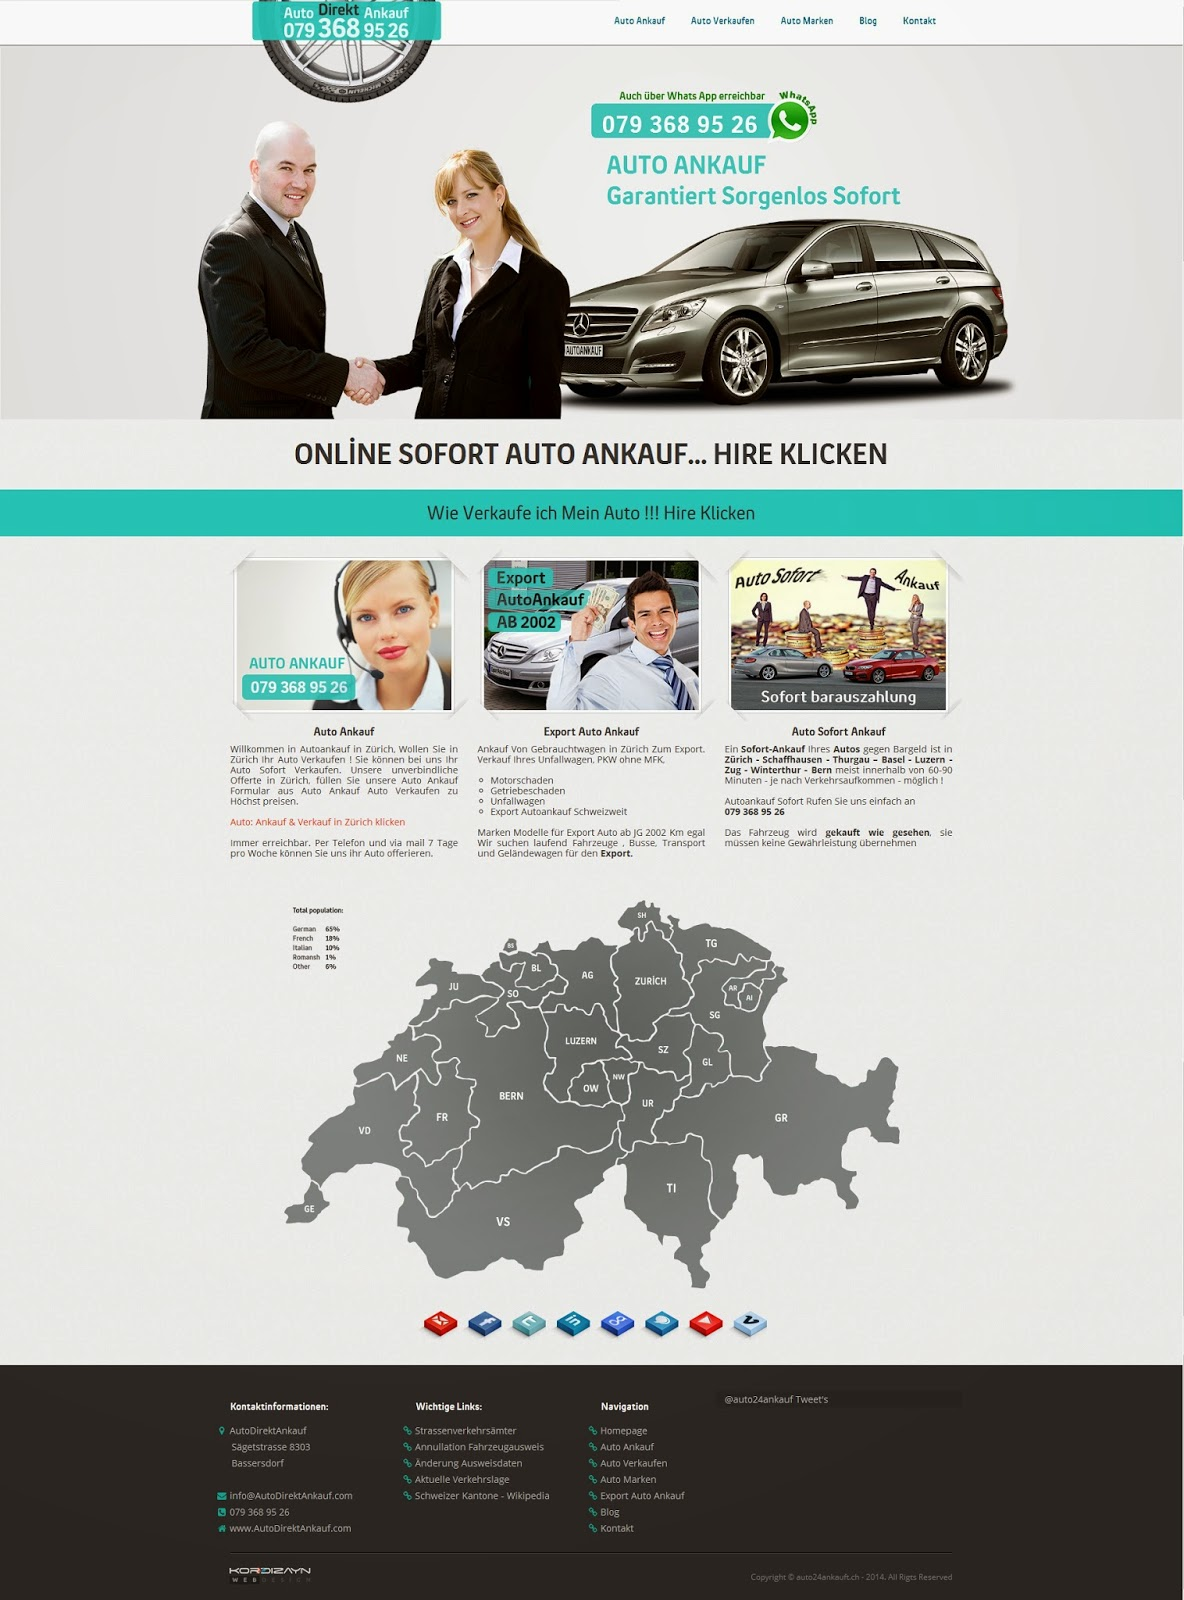 Auto Direkt Ankauf Web Tasarım